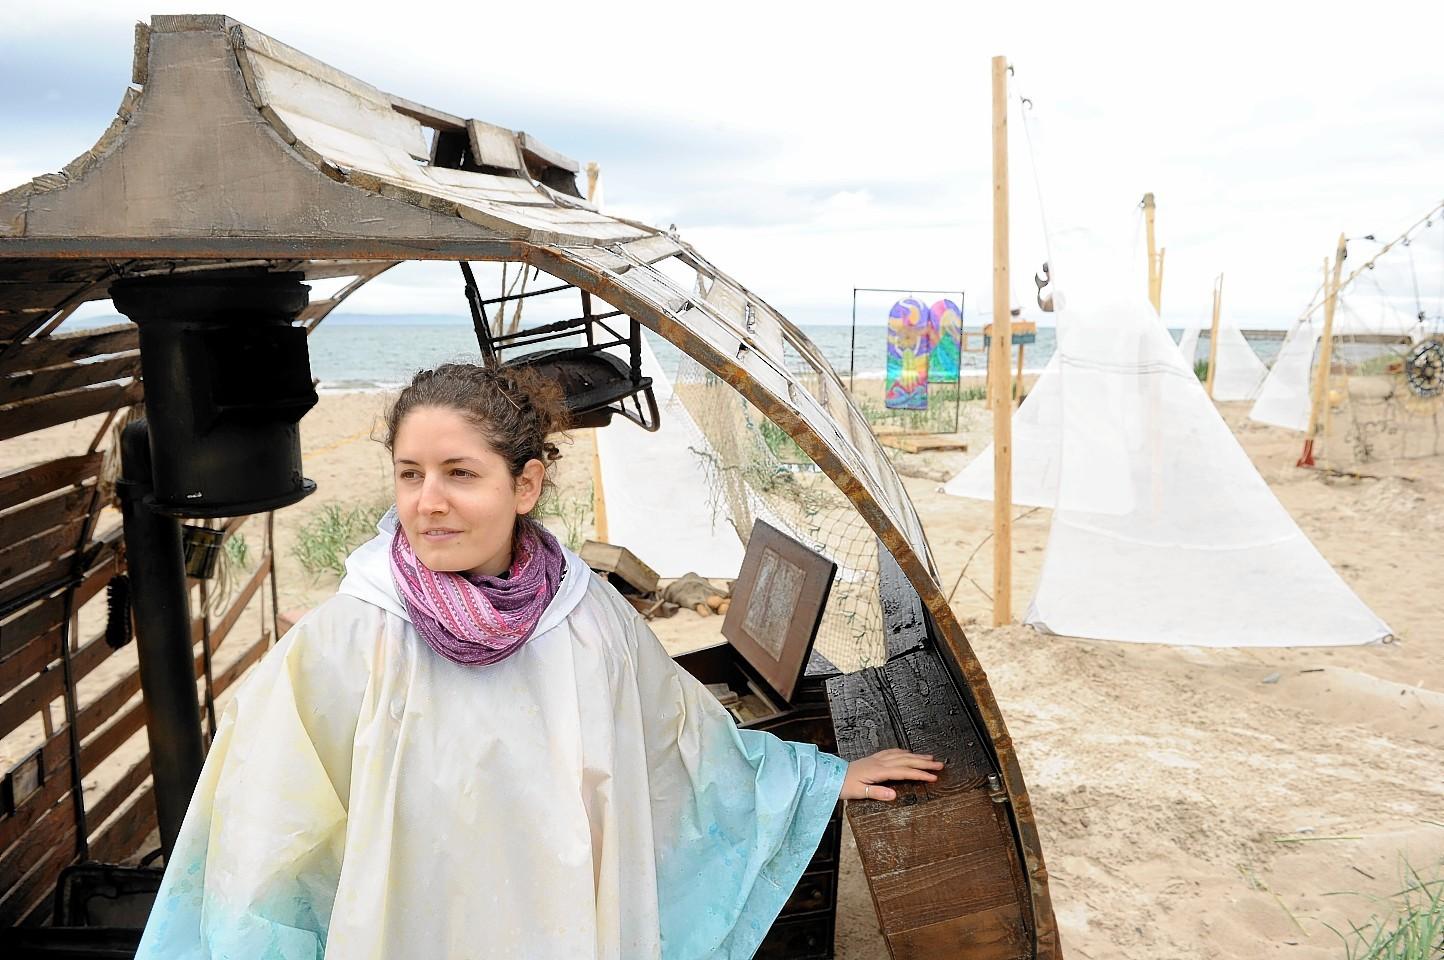 Irene Carita Morelli with her display on Nairn beach